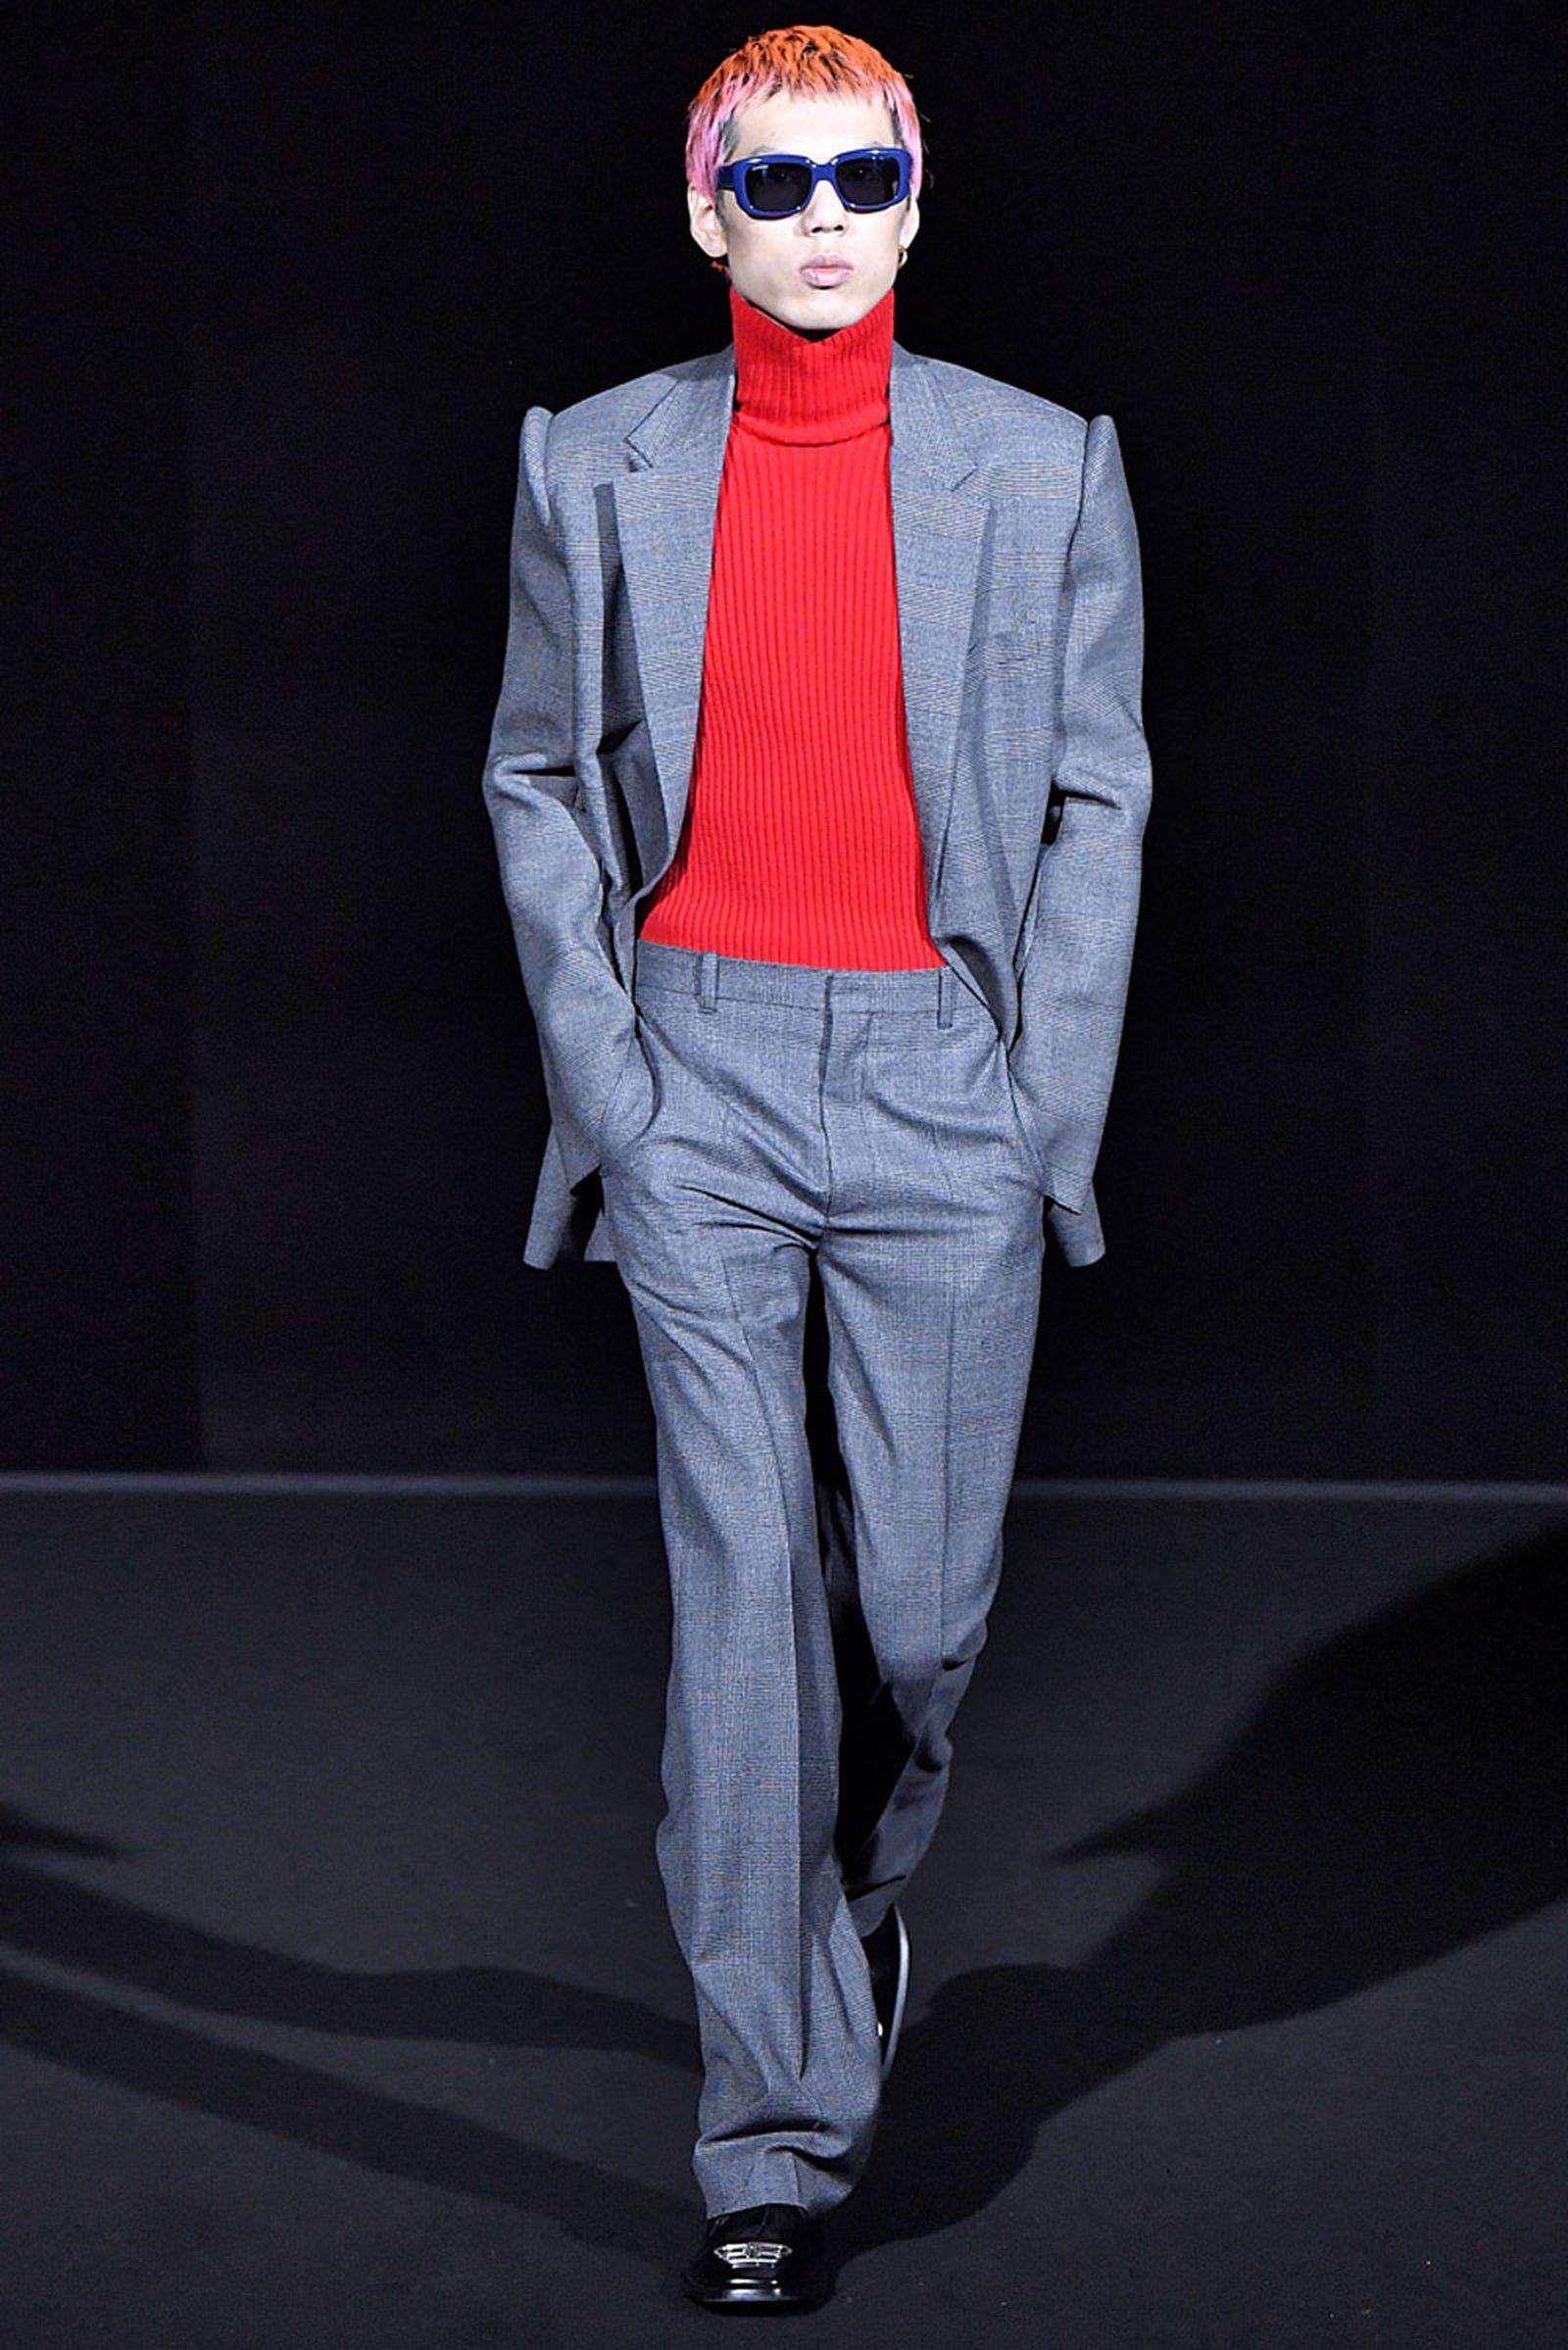 Balenciaga Runway Paris Fashion Week Womenswear Fall/Winter 2019/2020